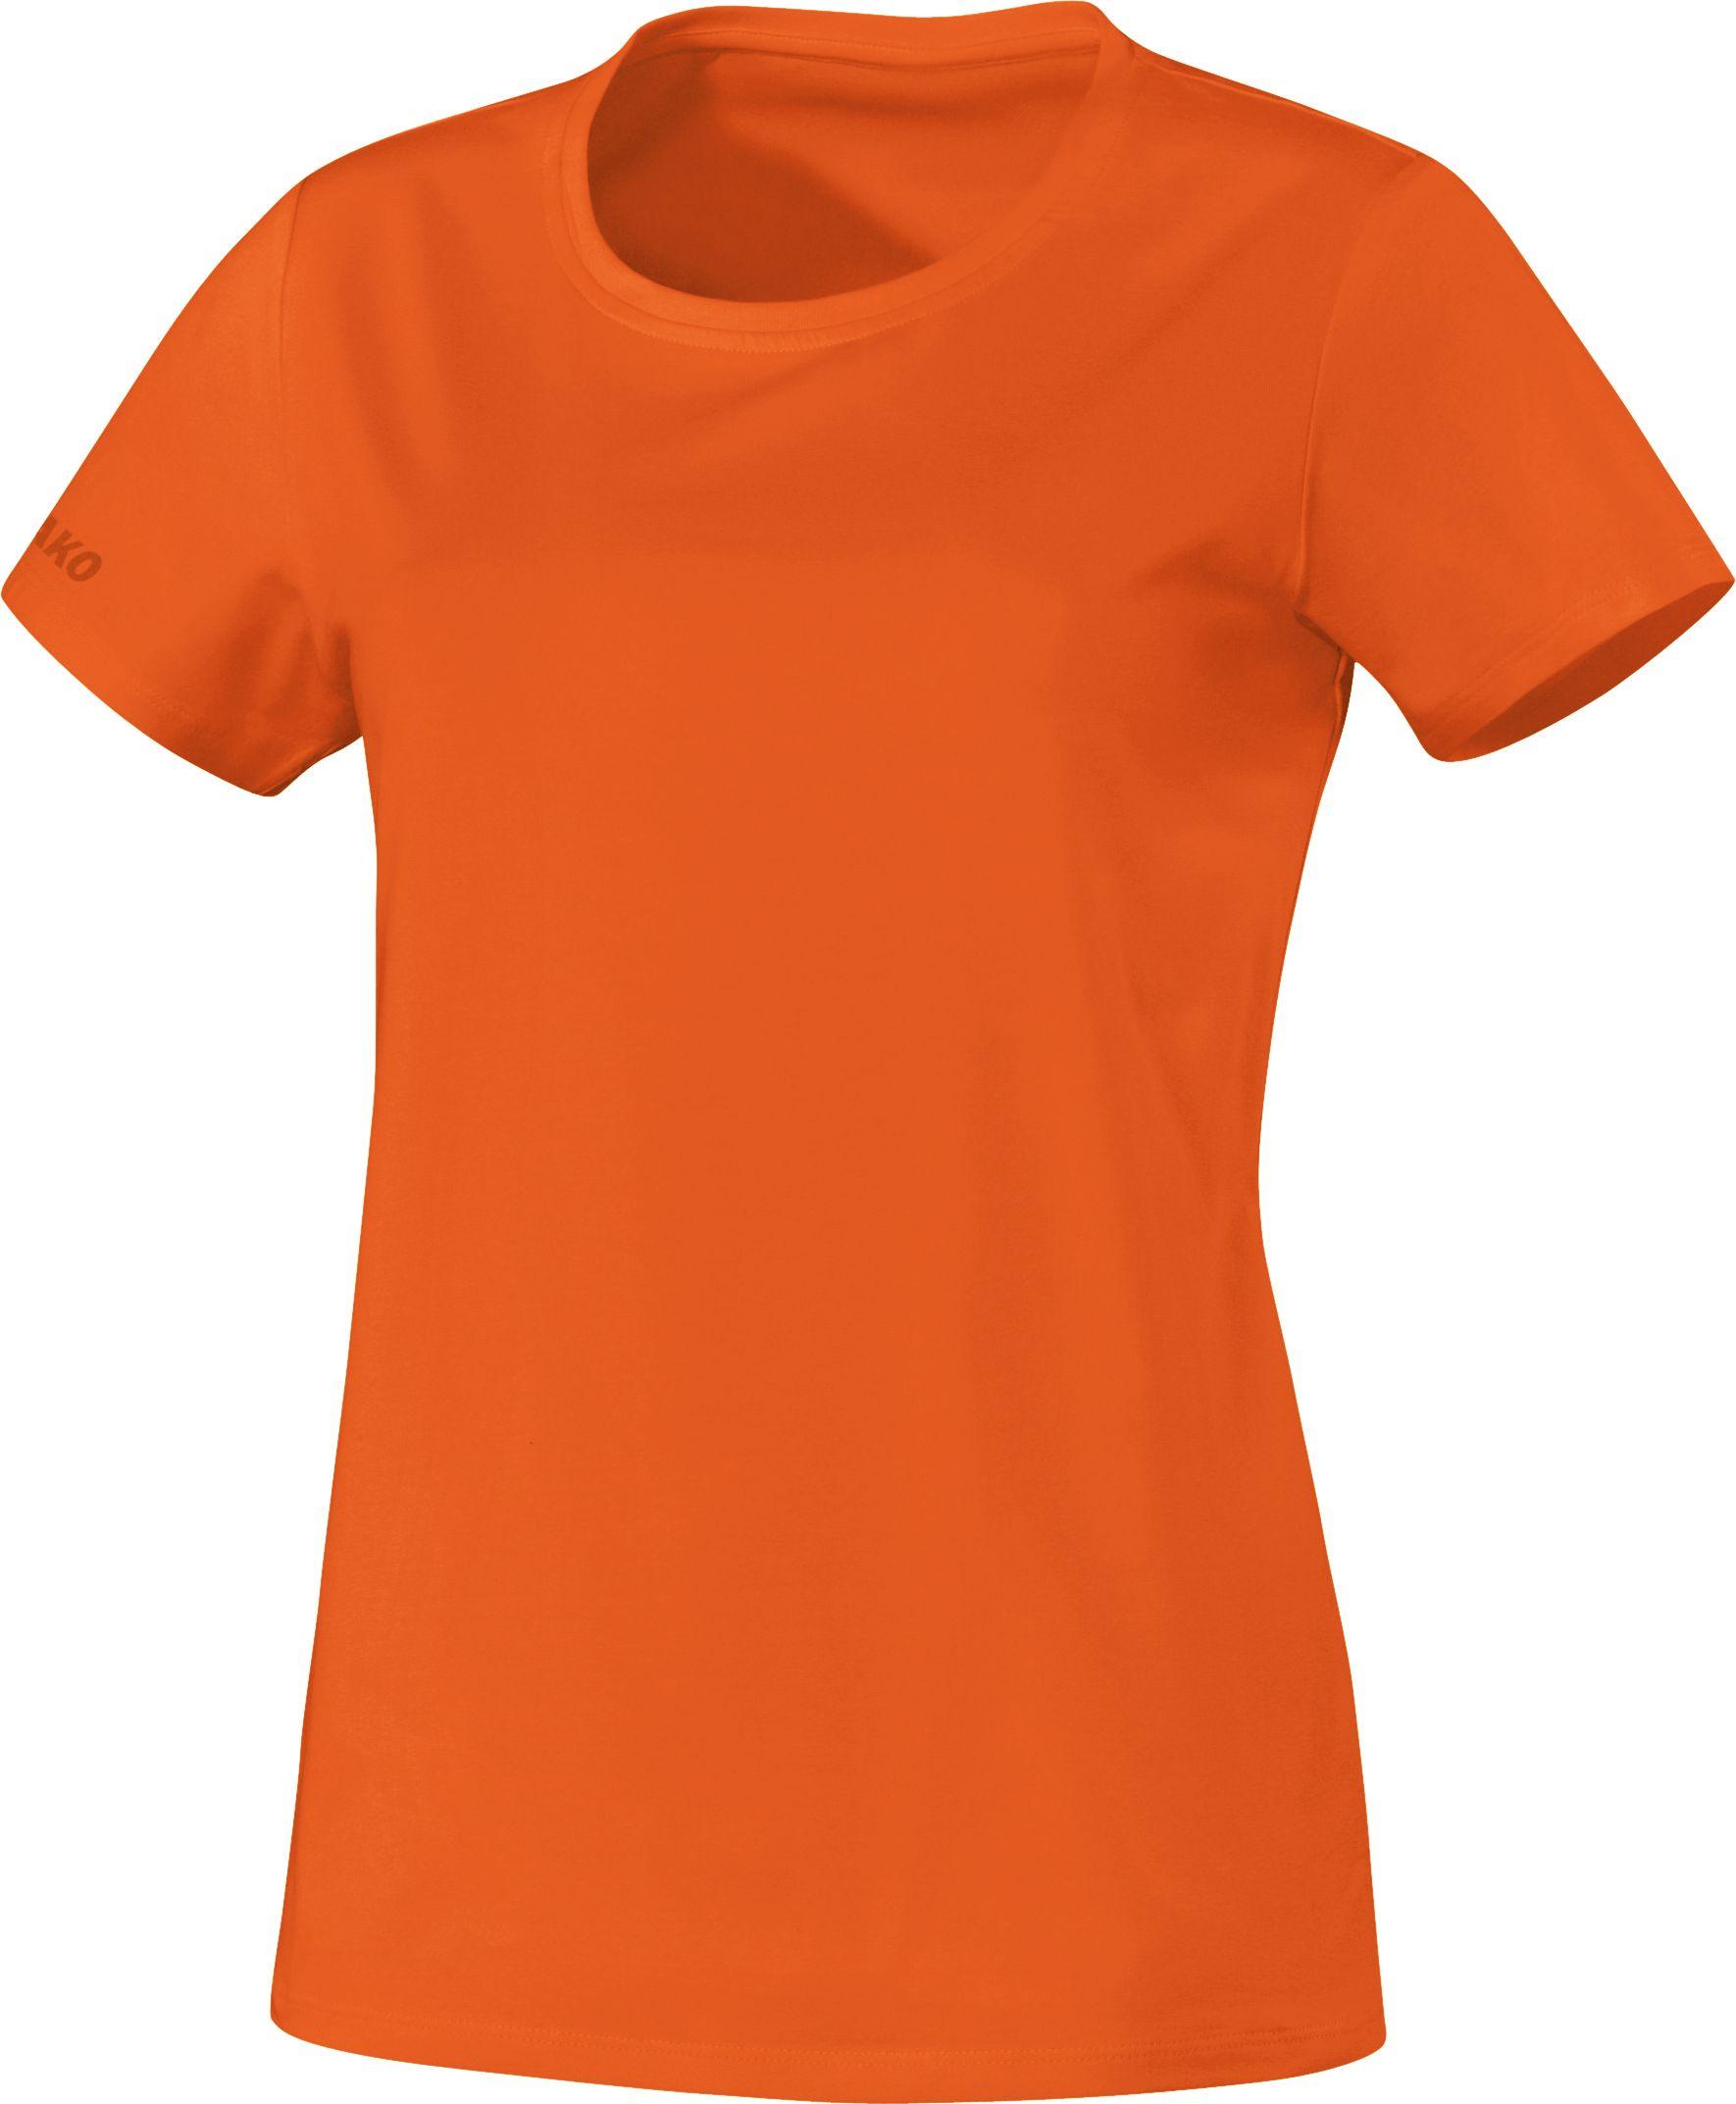 799da01f4bb Oranje Shirt Dames | Adidas Response S S T Shirts Casual Oranje ...